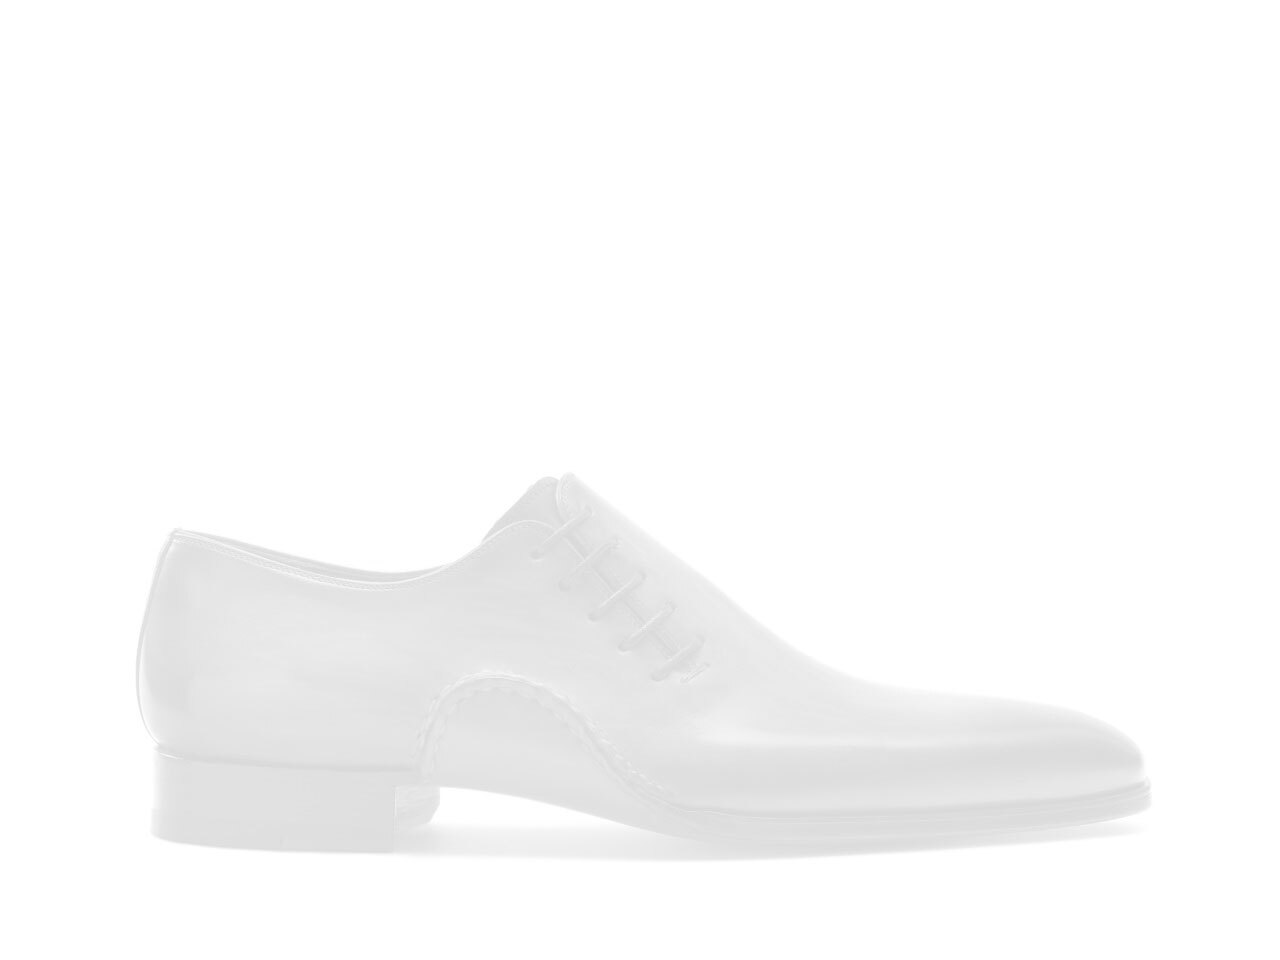 Sole of the Magnanni Franklin Cognac Men's Oxford Shoes